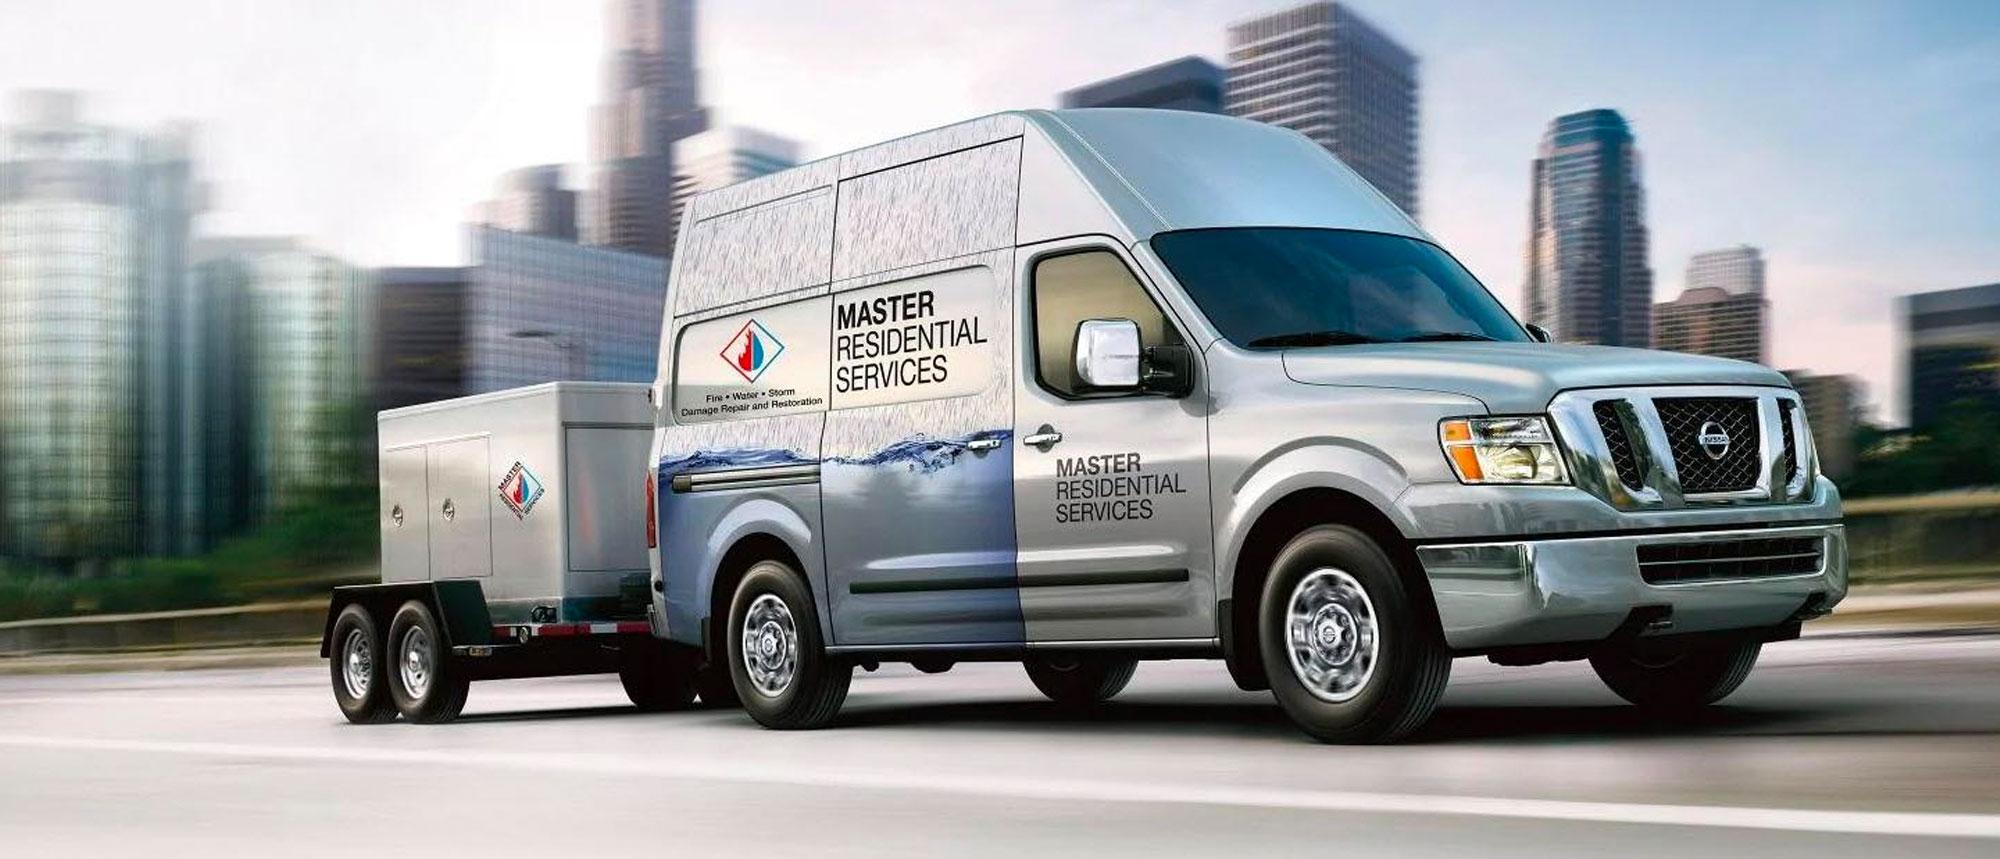 Silver Nissan Commercial Van in Urban Setting